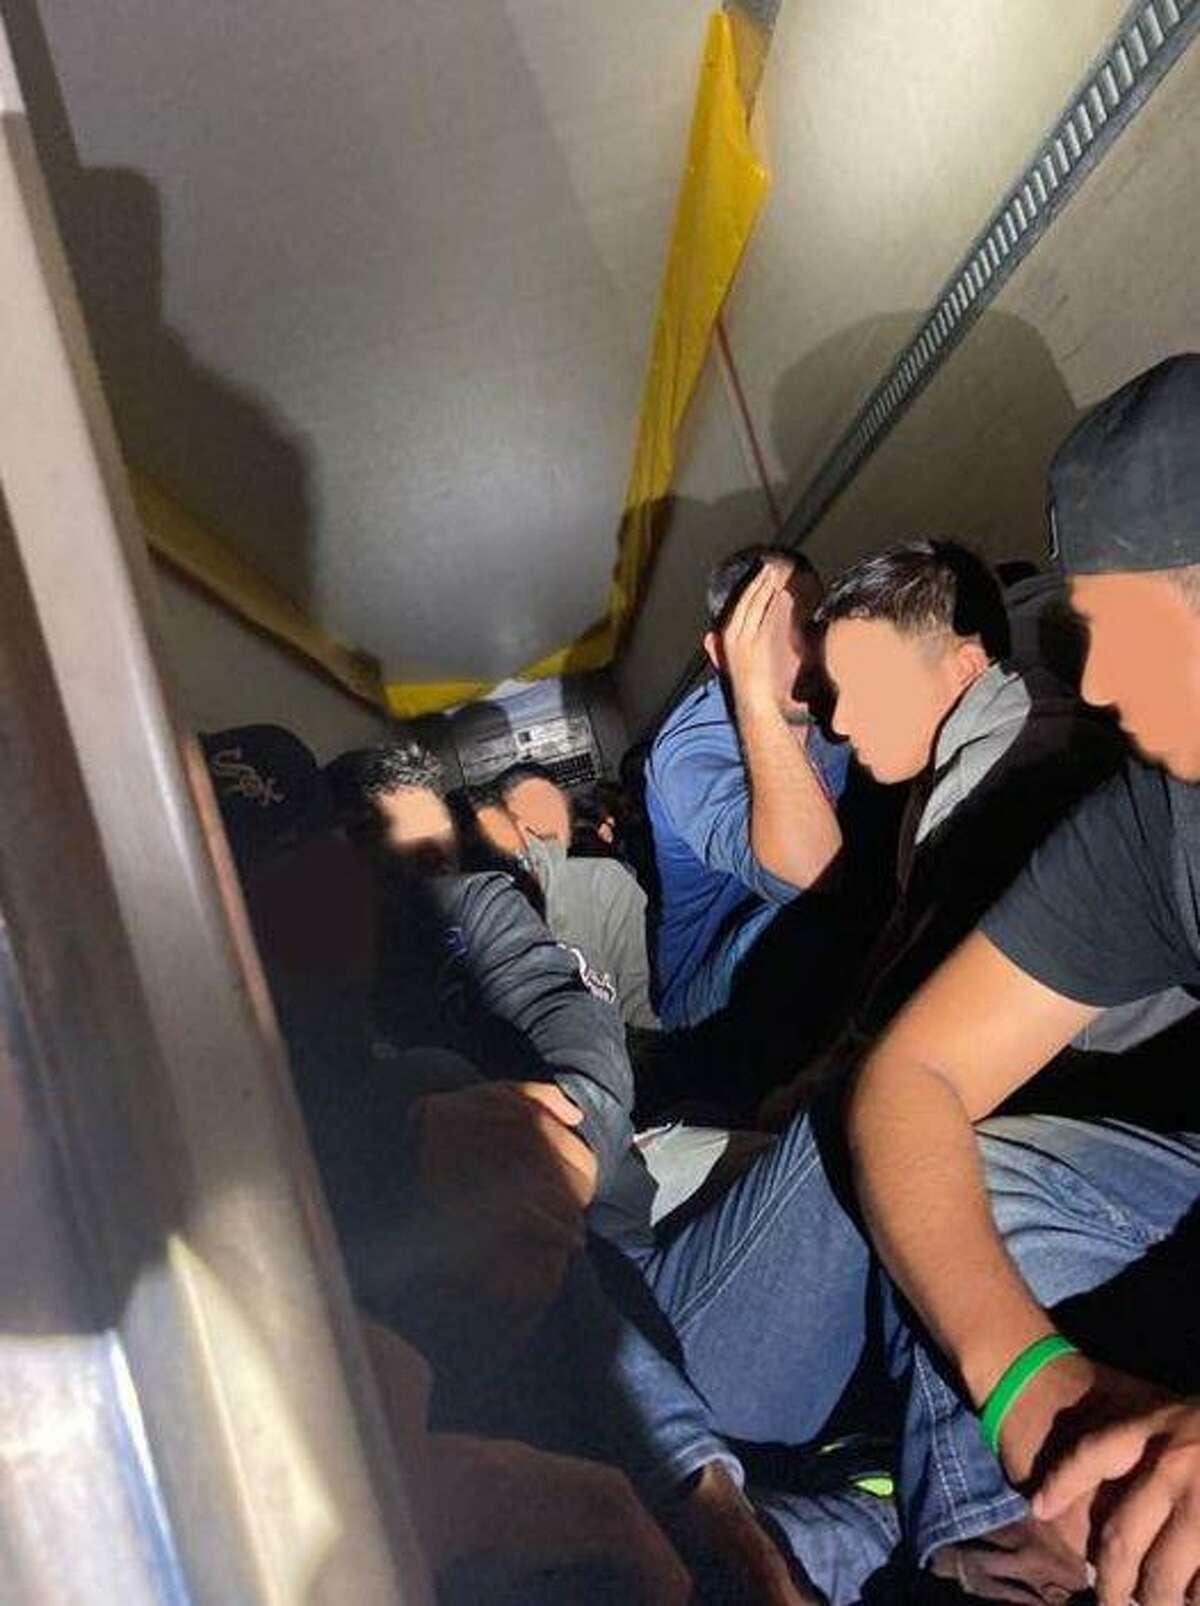 U.S. Border Patrol agents said they found 72 migrants inside a locked trailer.